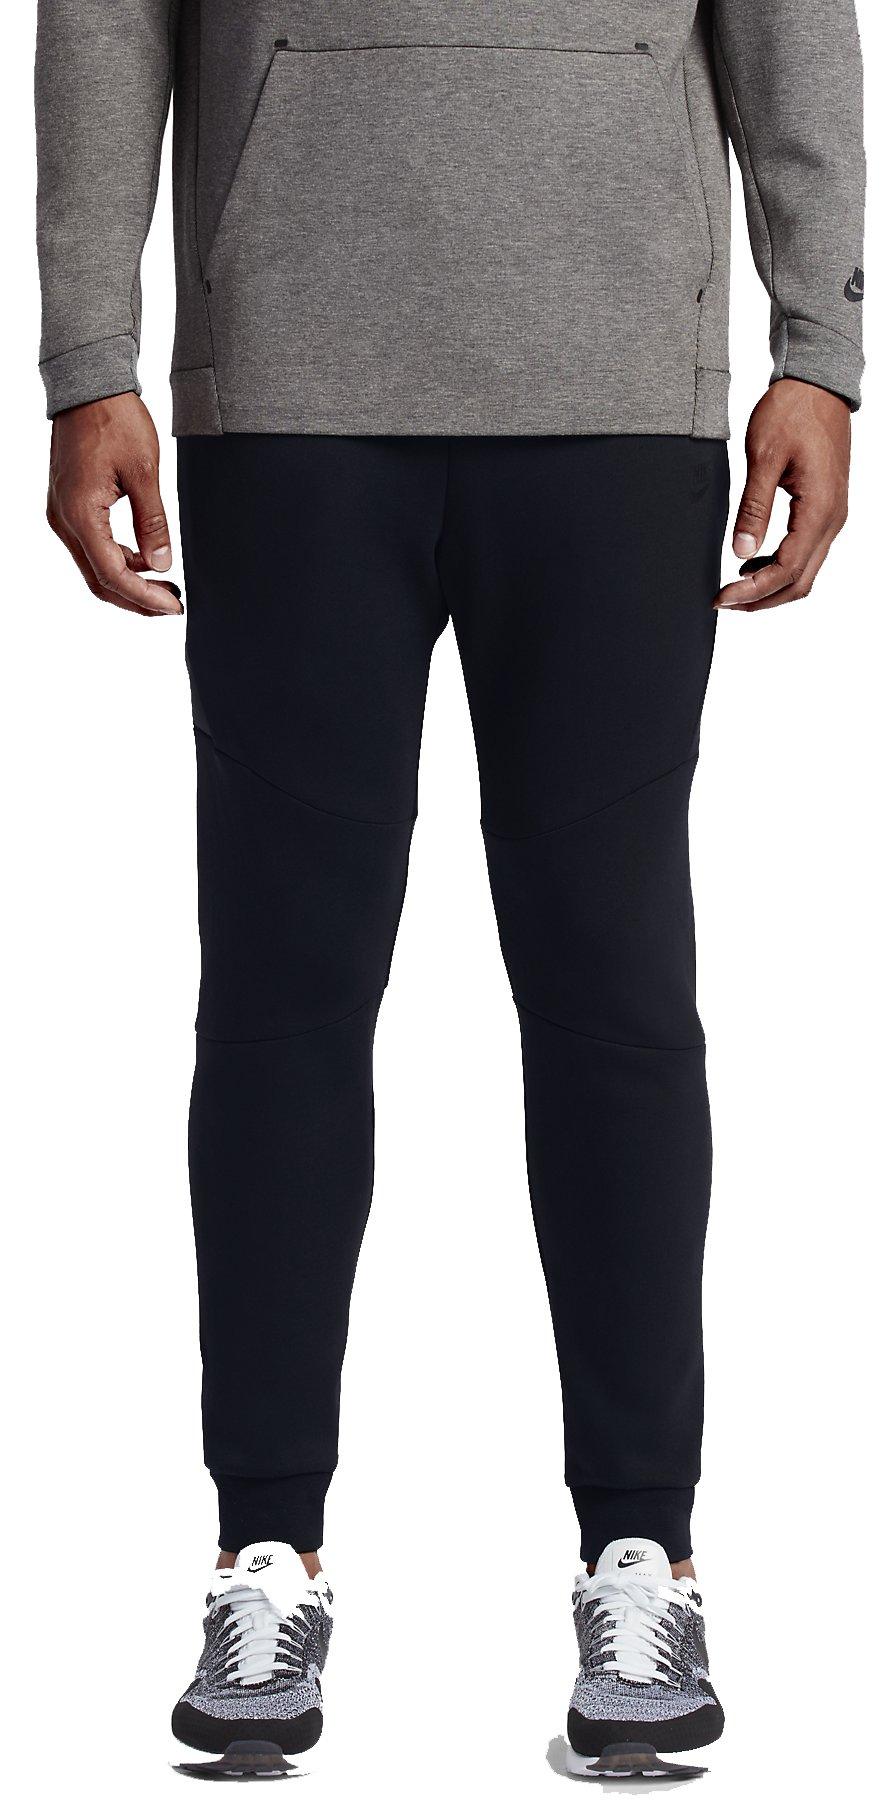 Kalhoty Nike M NSW TCH FLC JOGGER